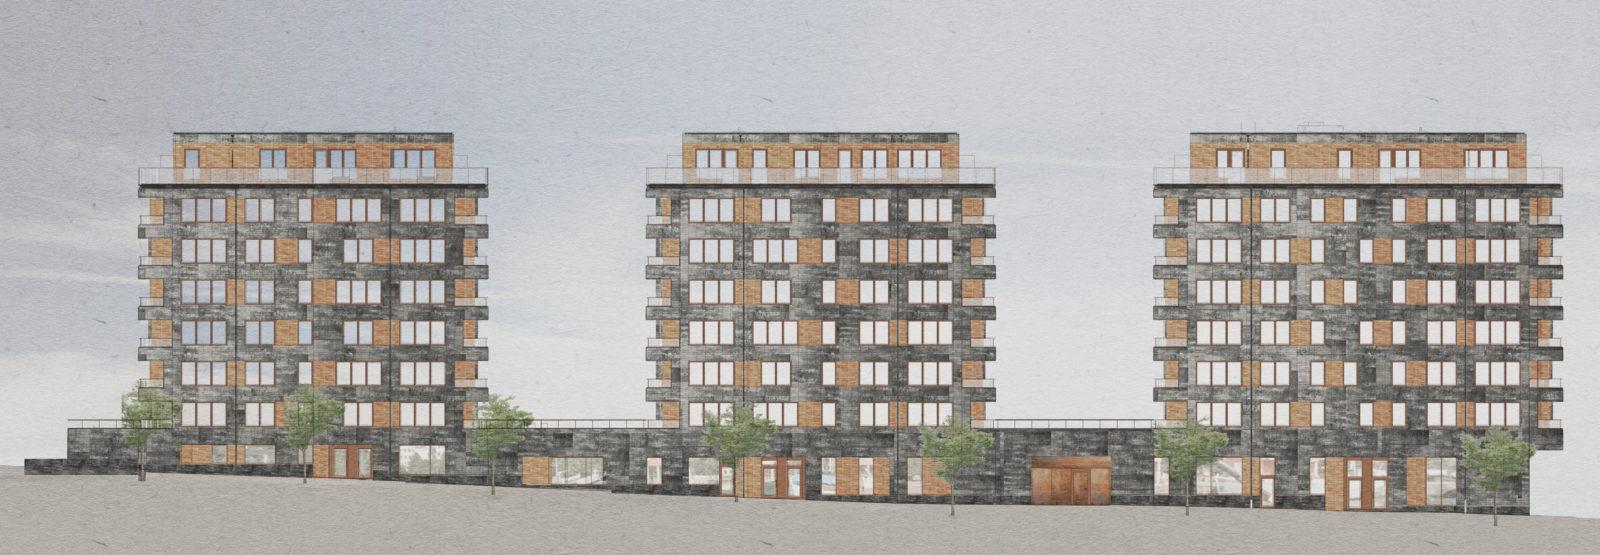 KjellanderSjöberg Fredriksdal fasad 02